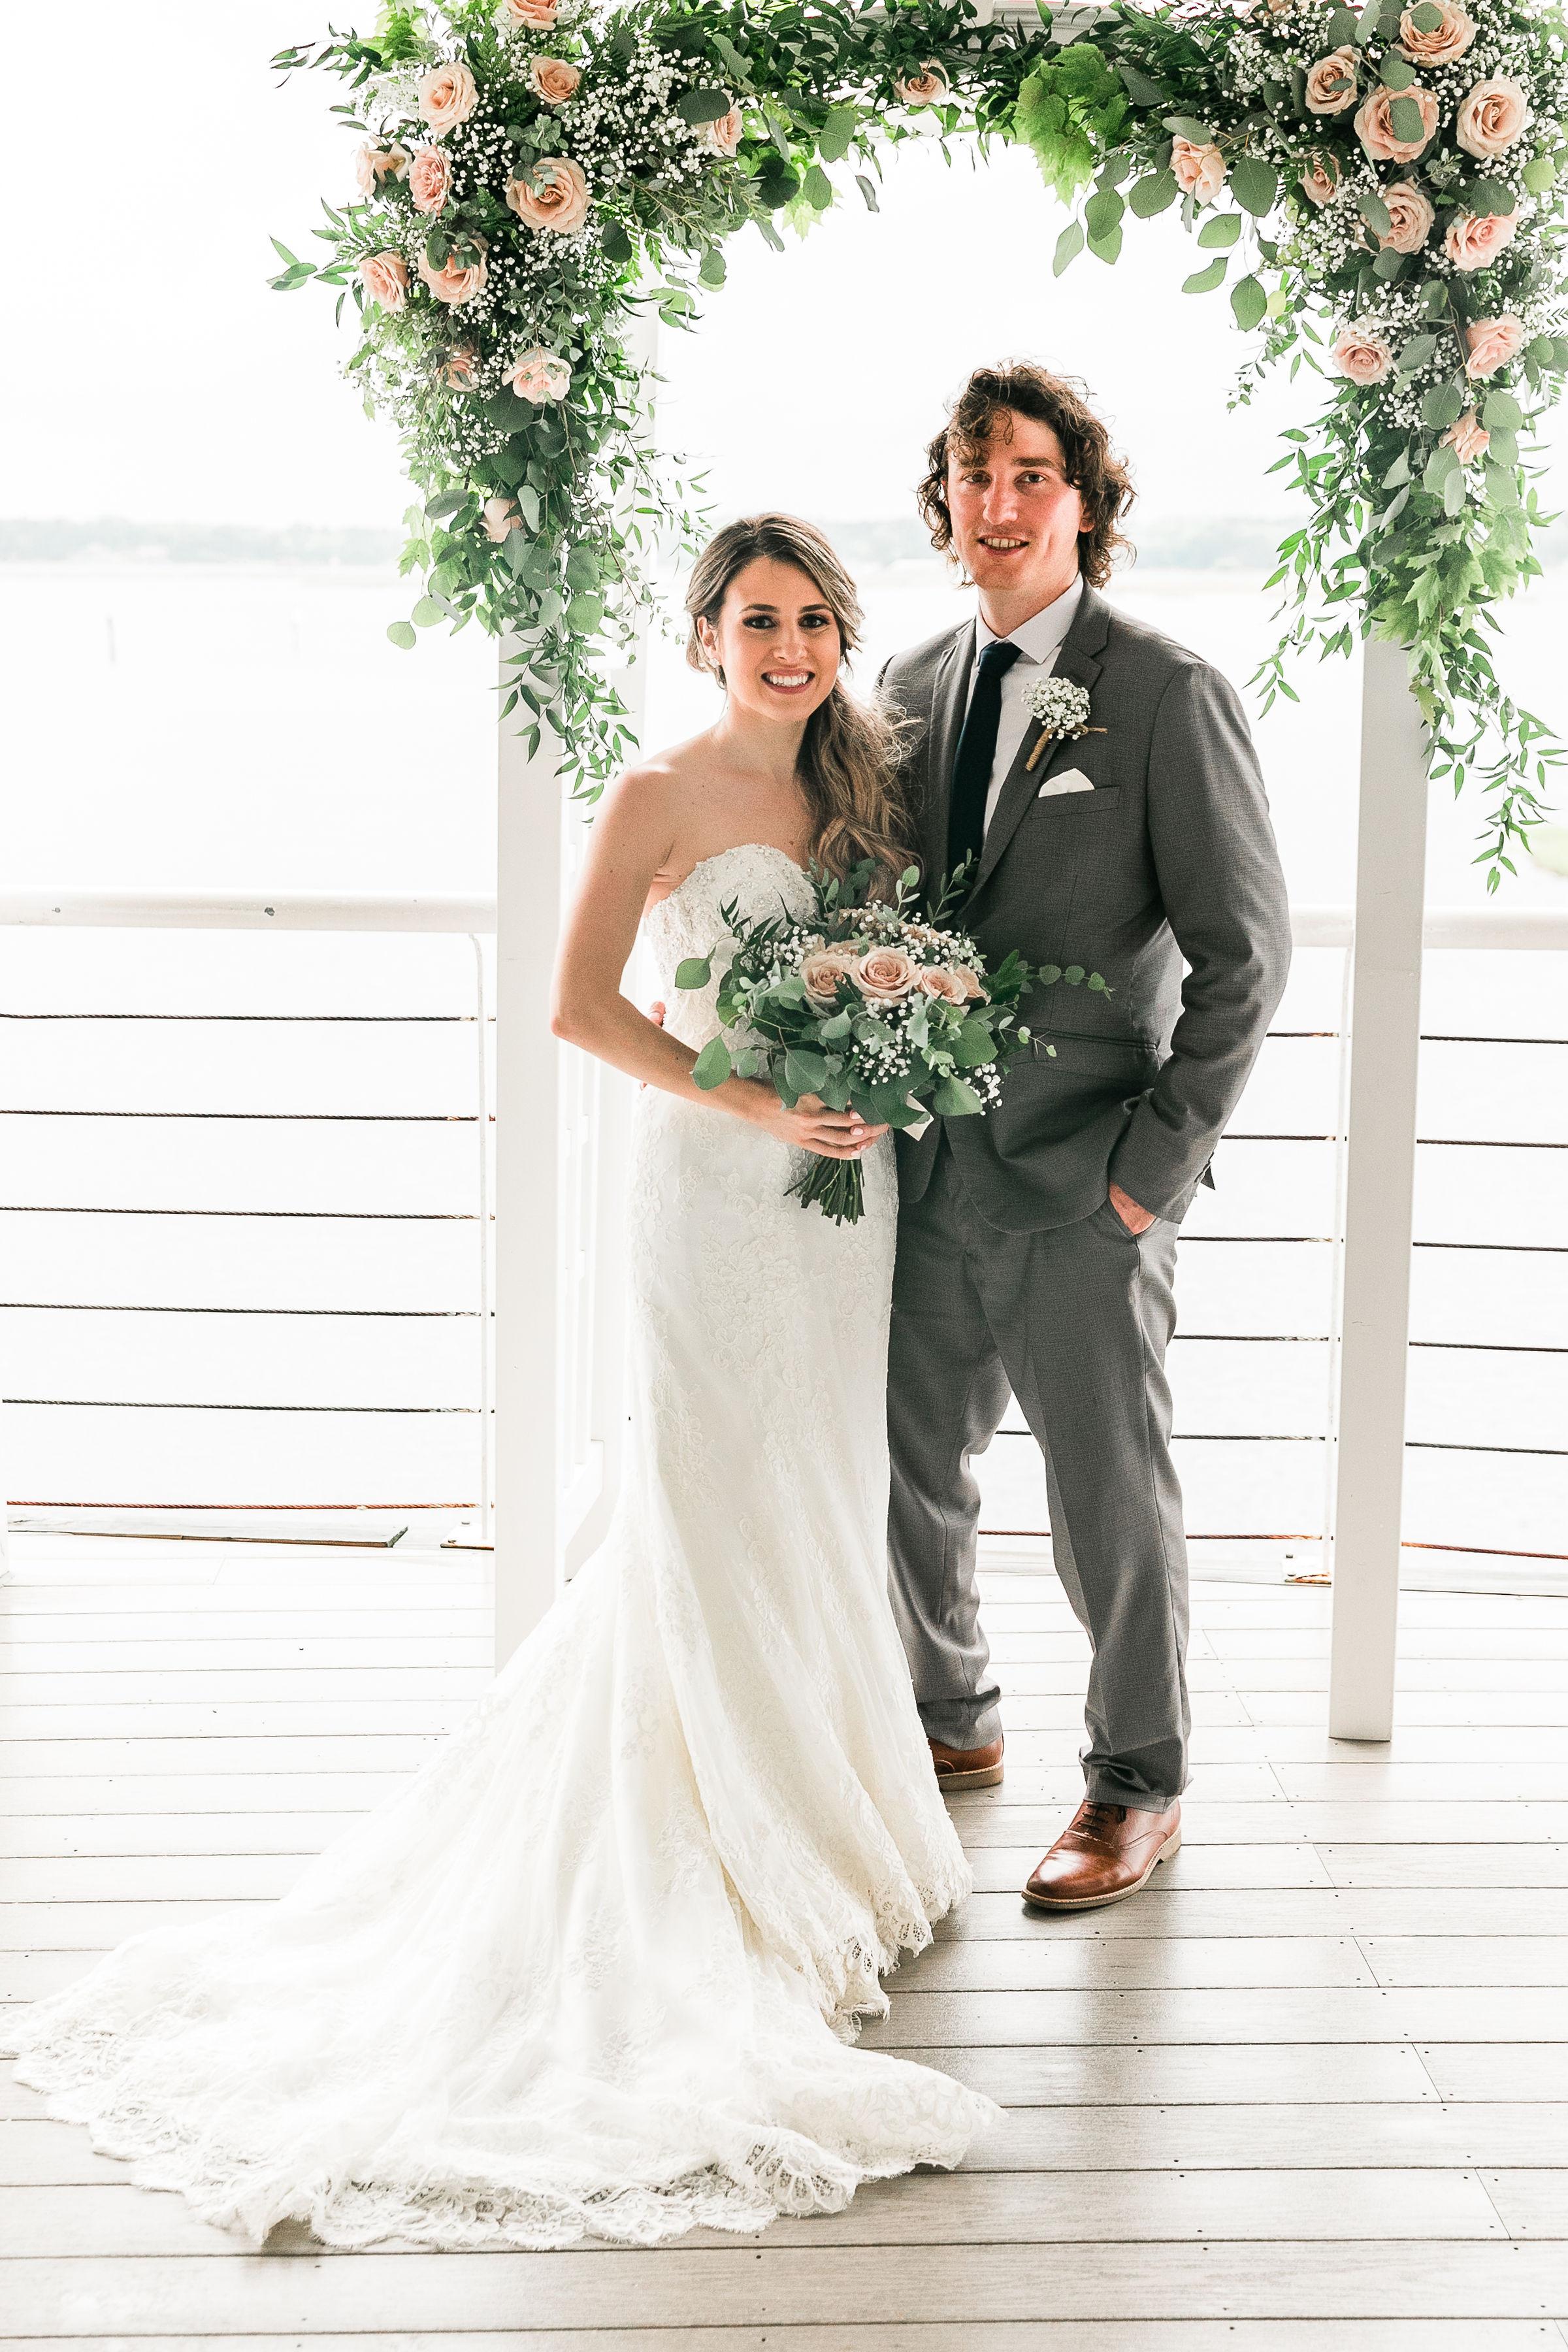 Nicole&Bryce_Ceremony-8.jpg